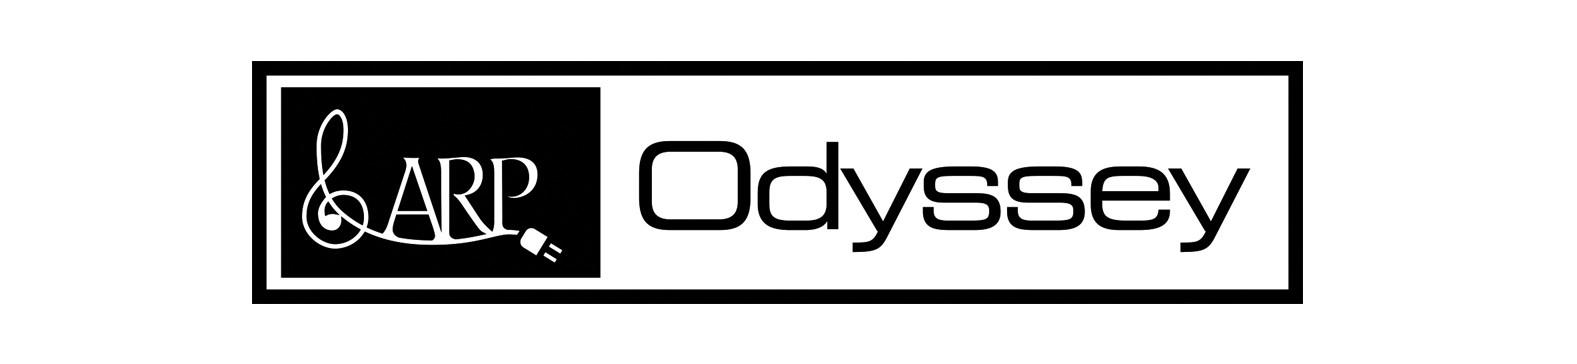 ARP Odyssey